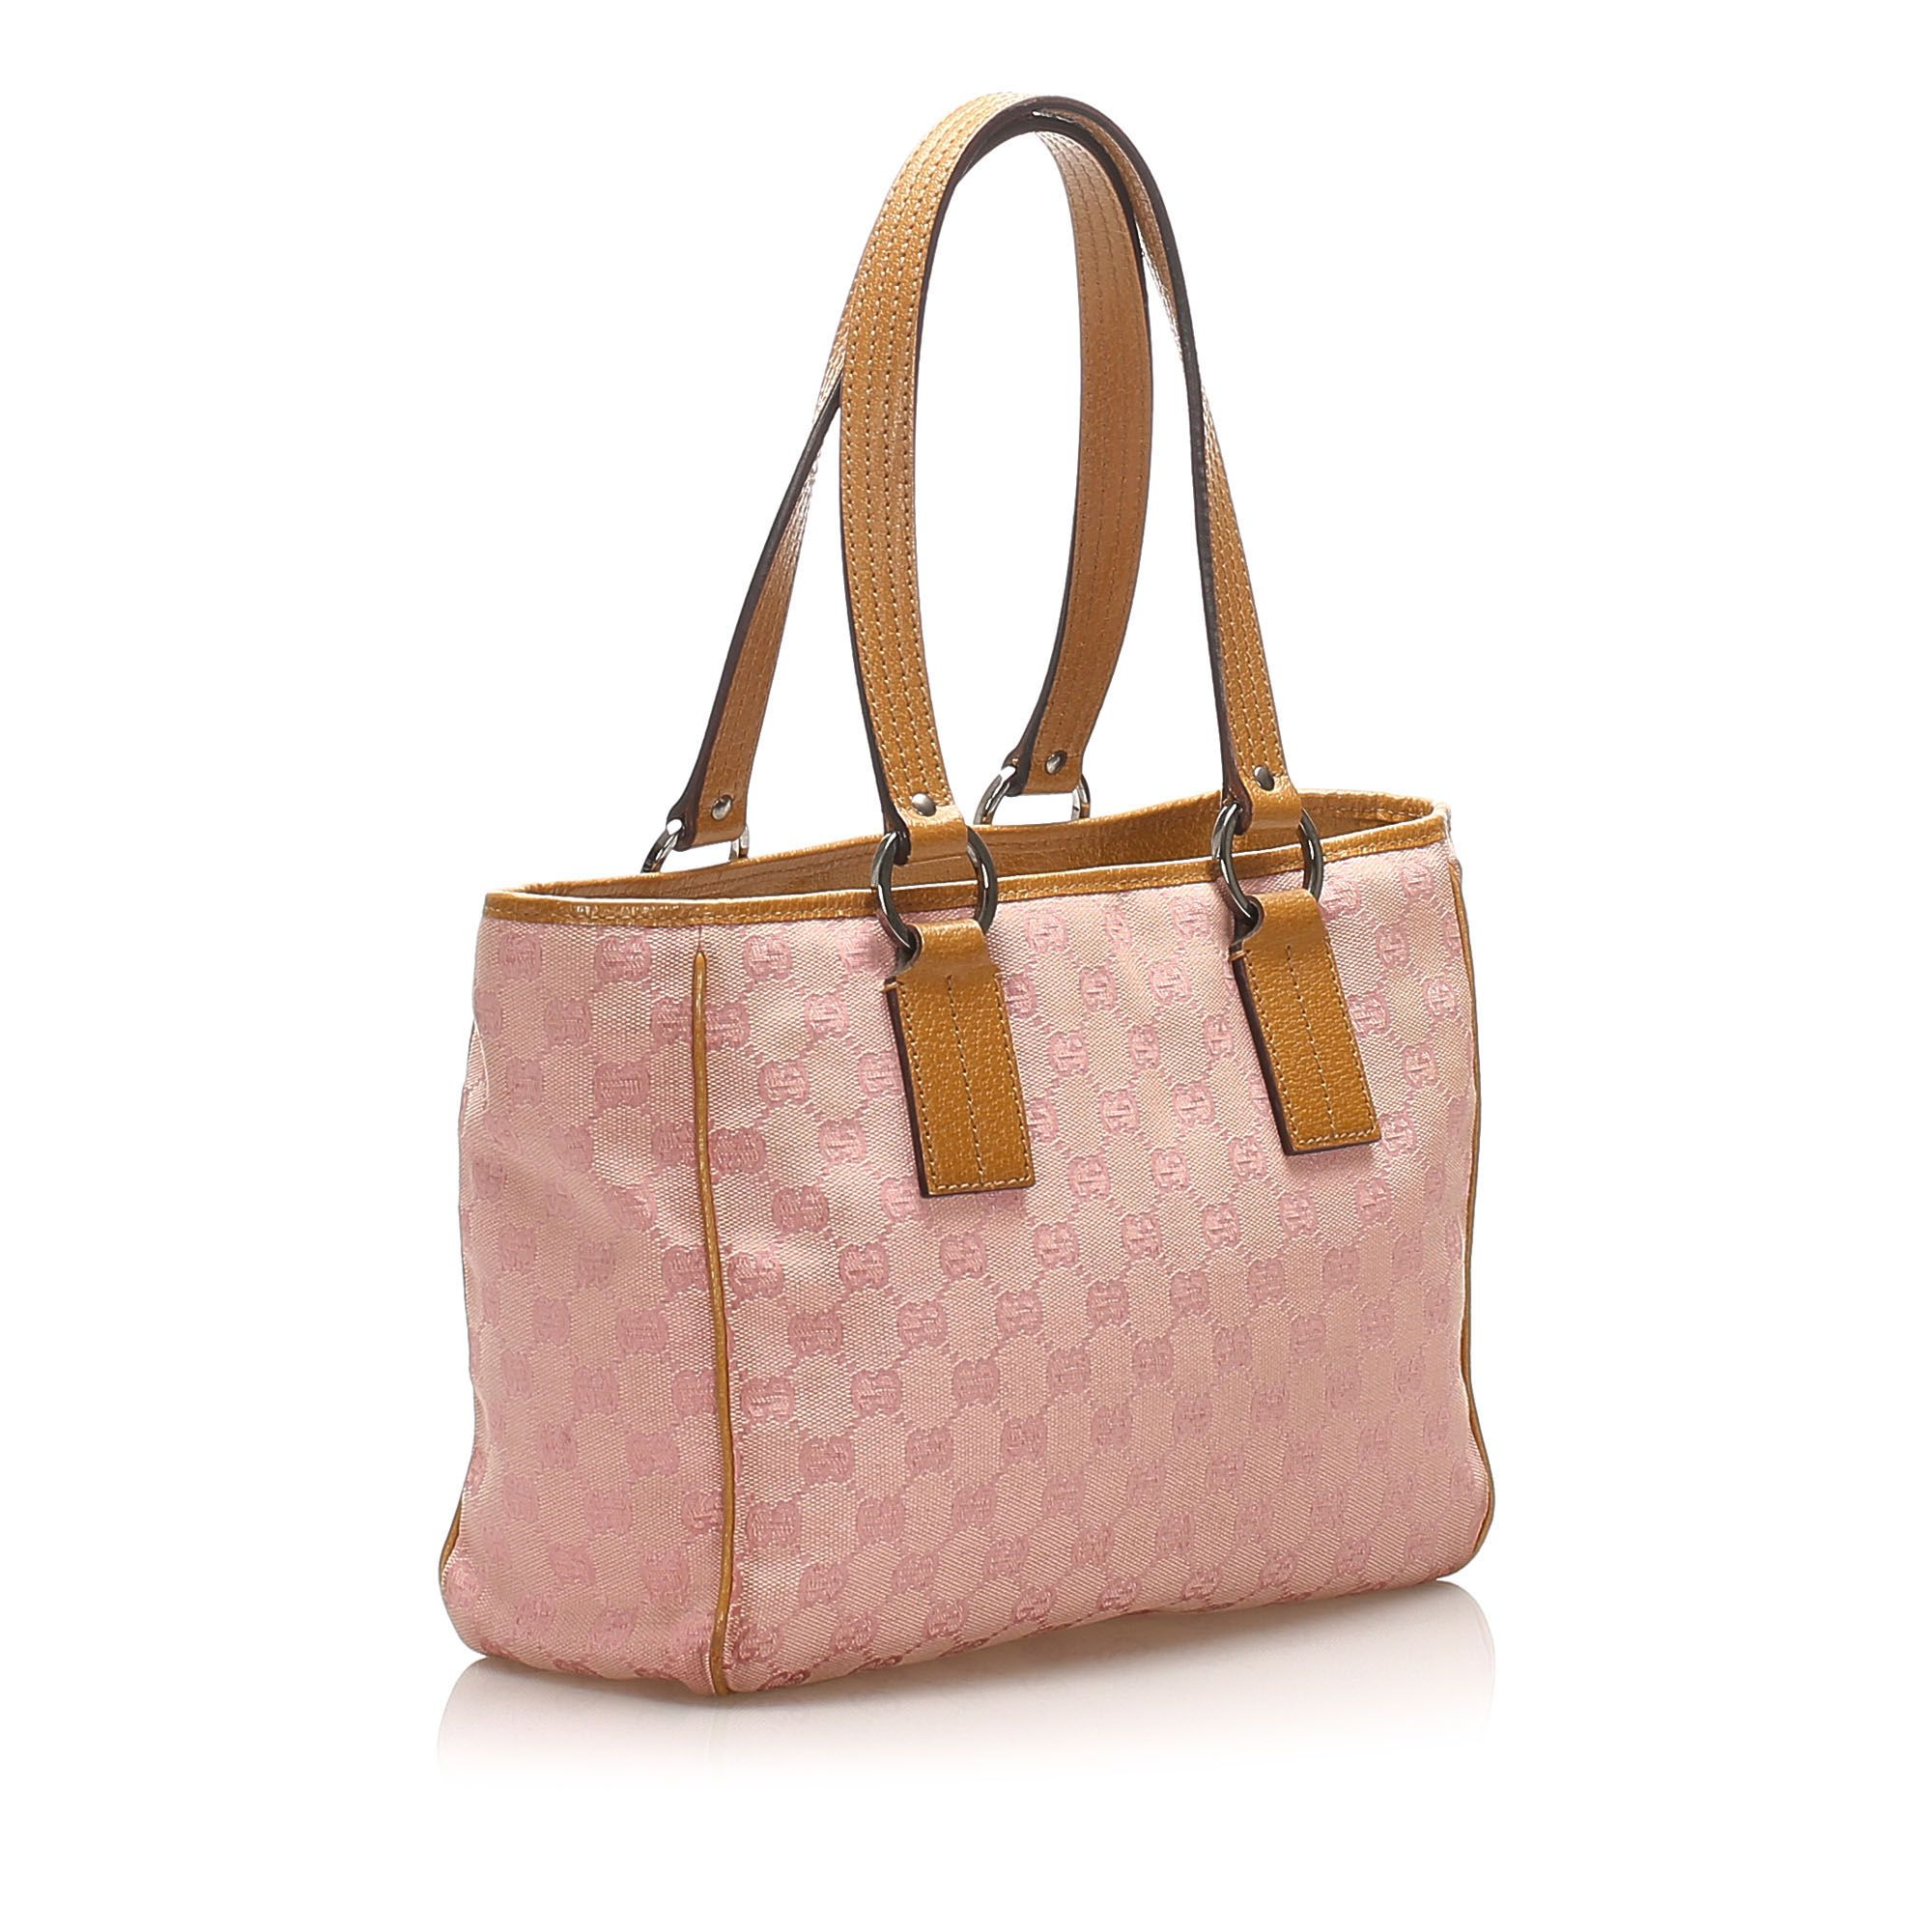 Vintage Gucci GG Canvas Tote Bag Pink